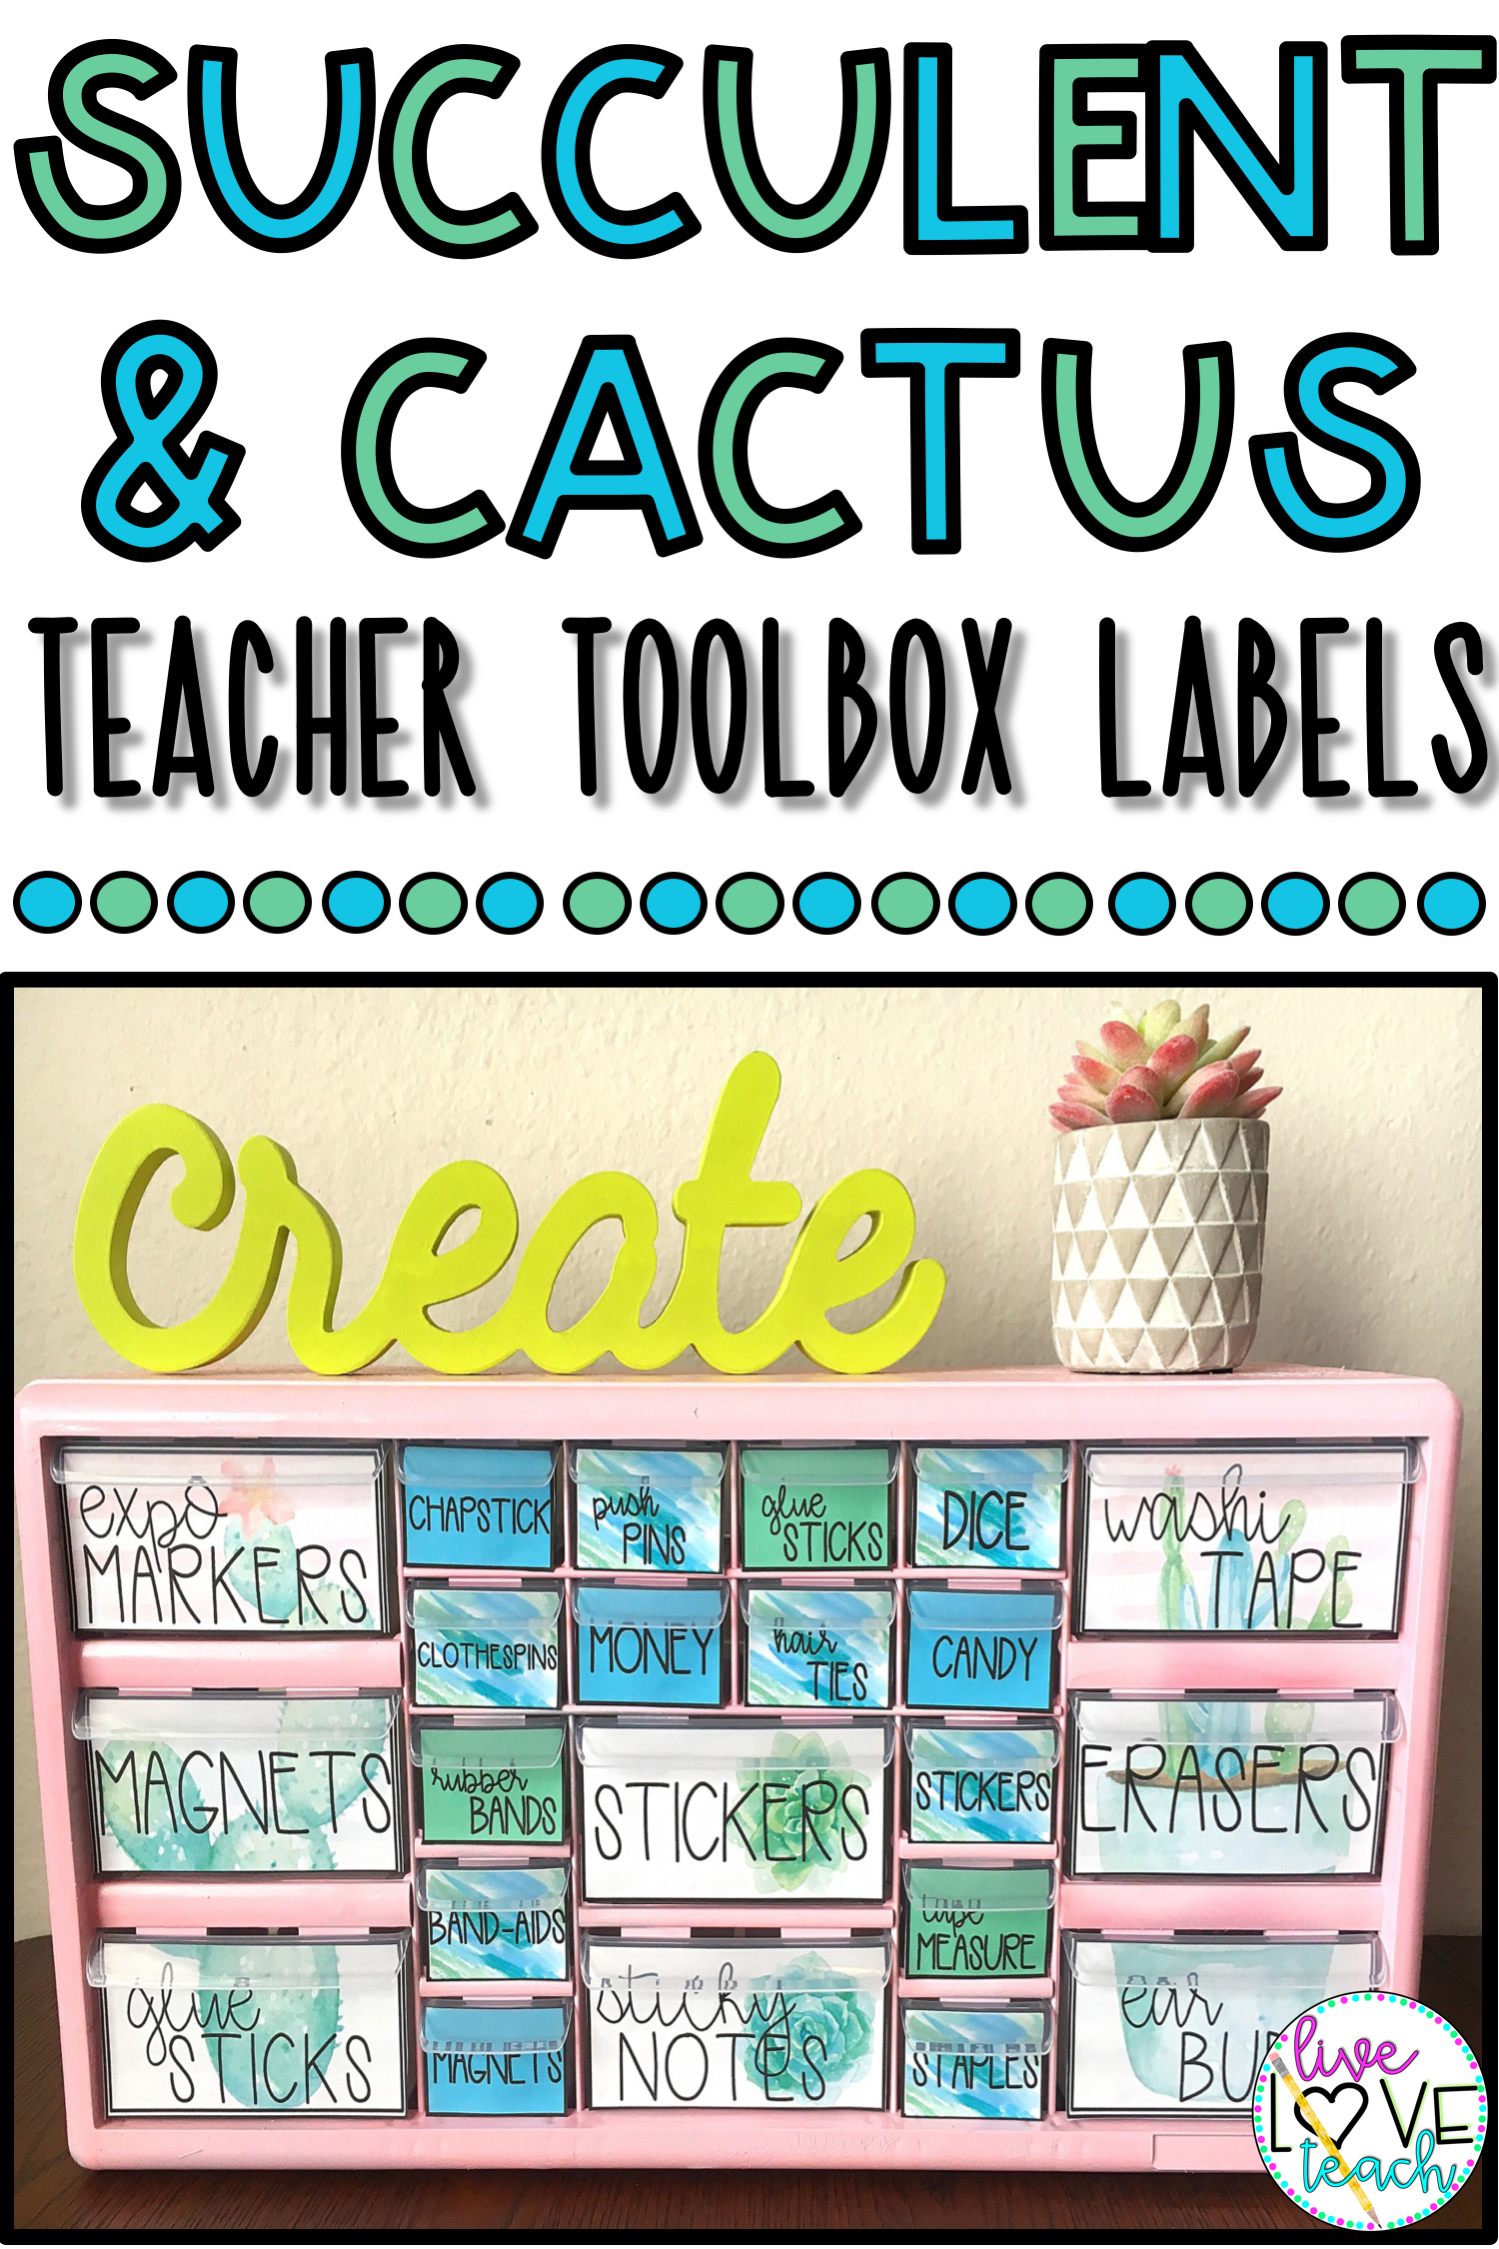 Editable Teacher Toolbox Labels Succulent Cactus Teacher Toolbox Labels Teacher Toolbox Lesson Plan Organization